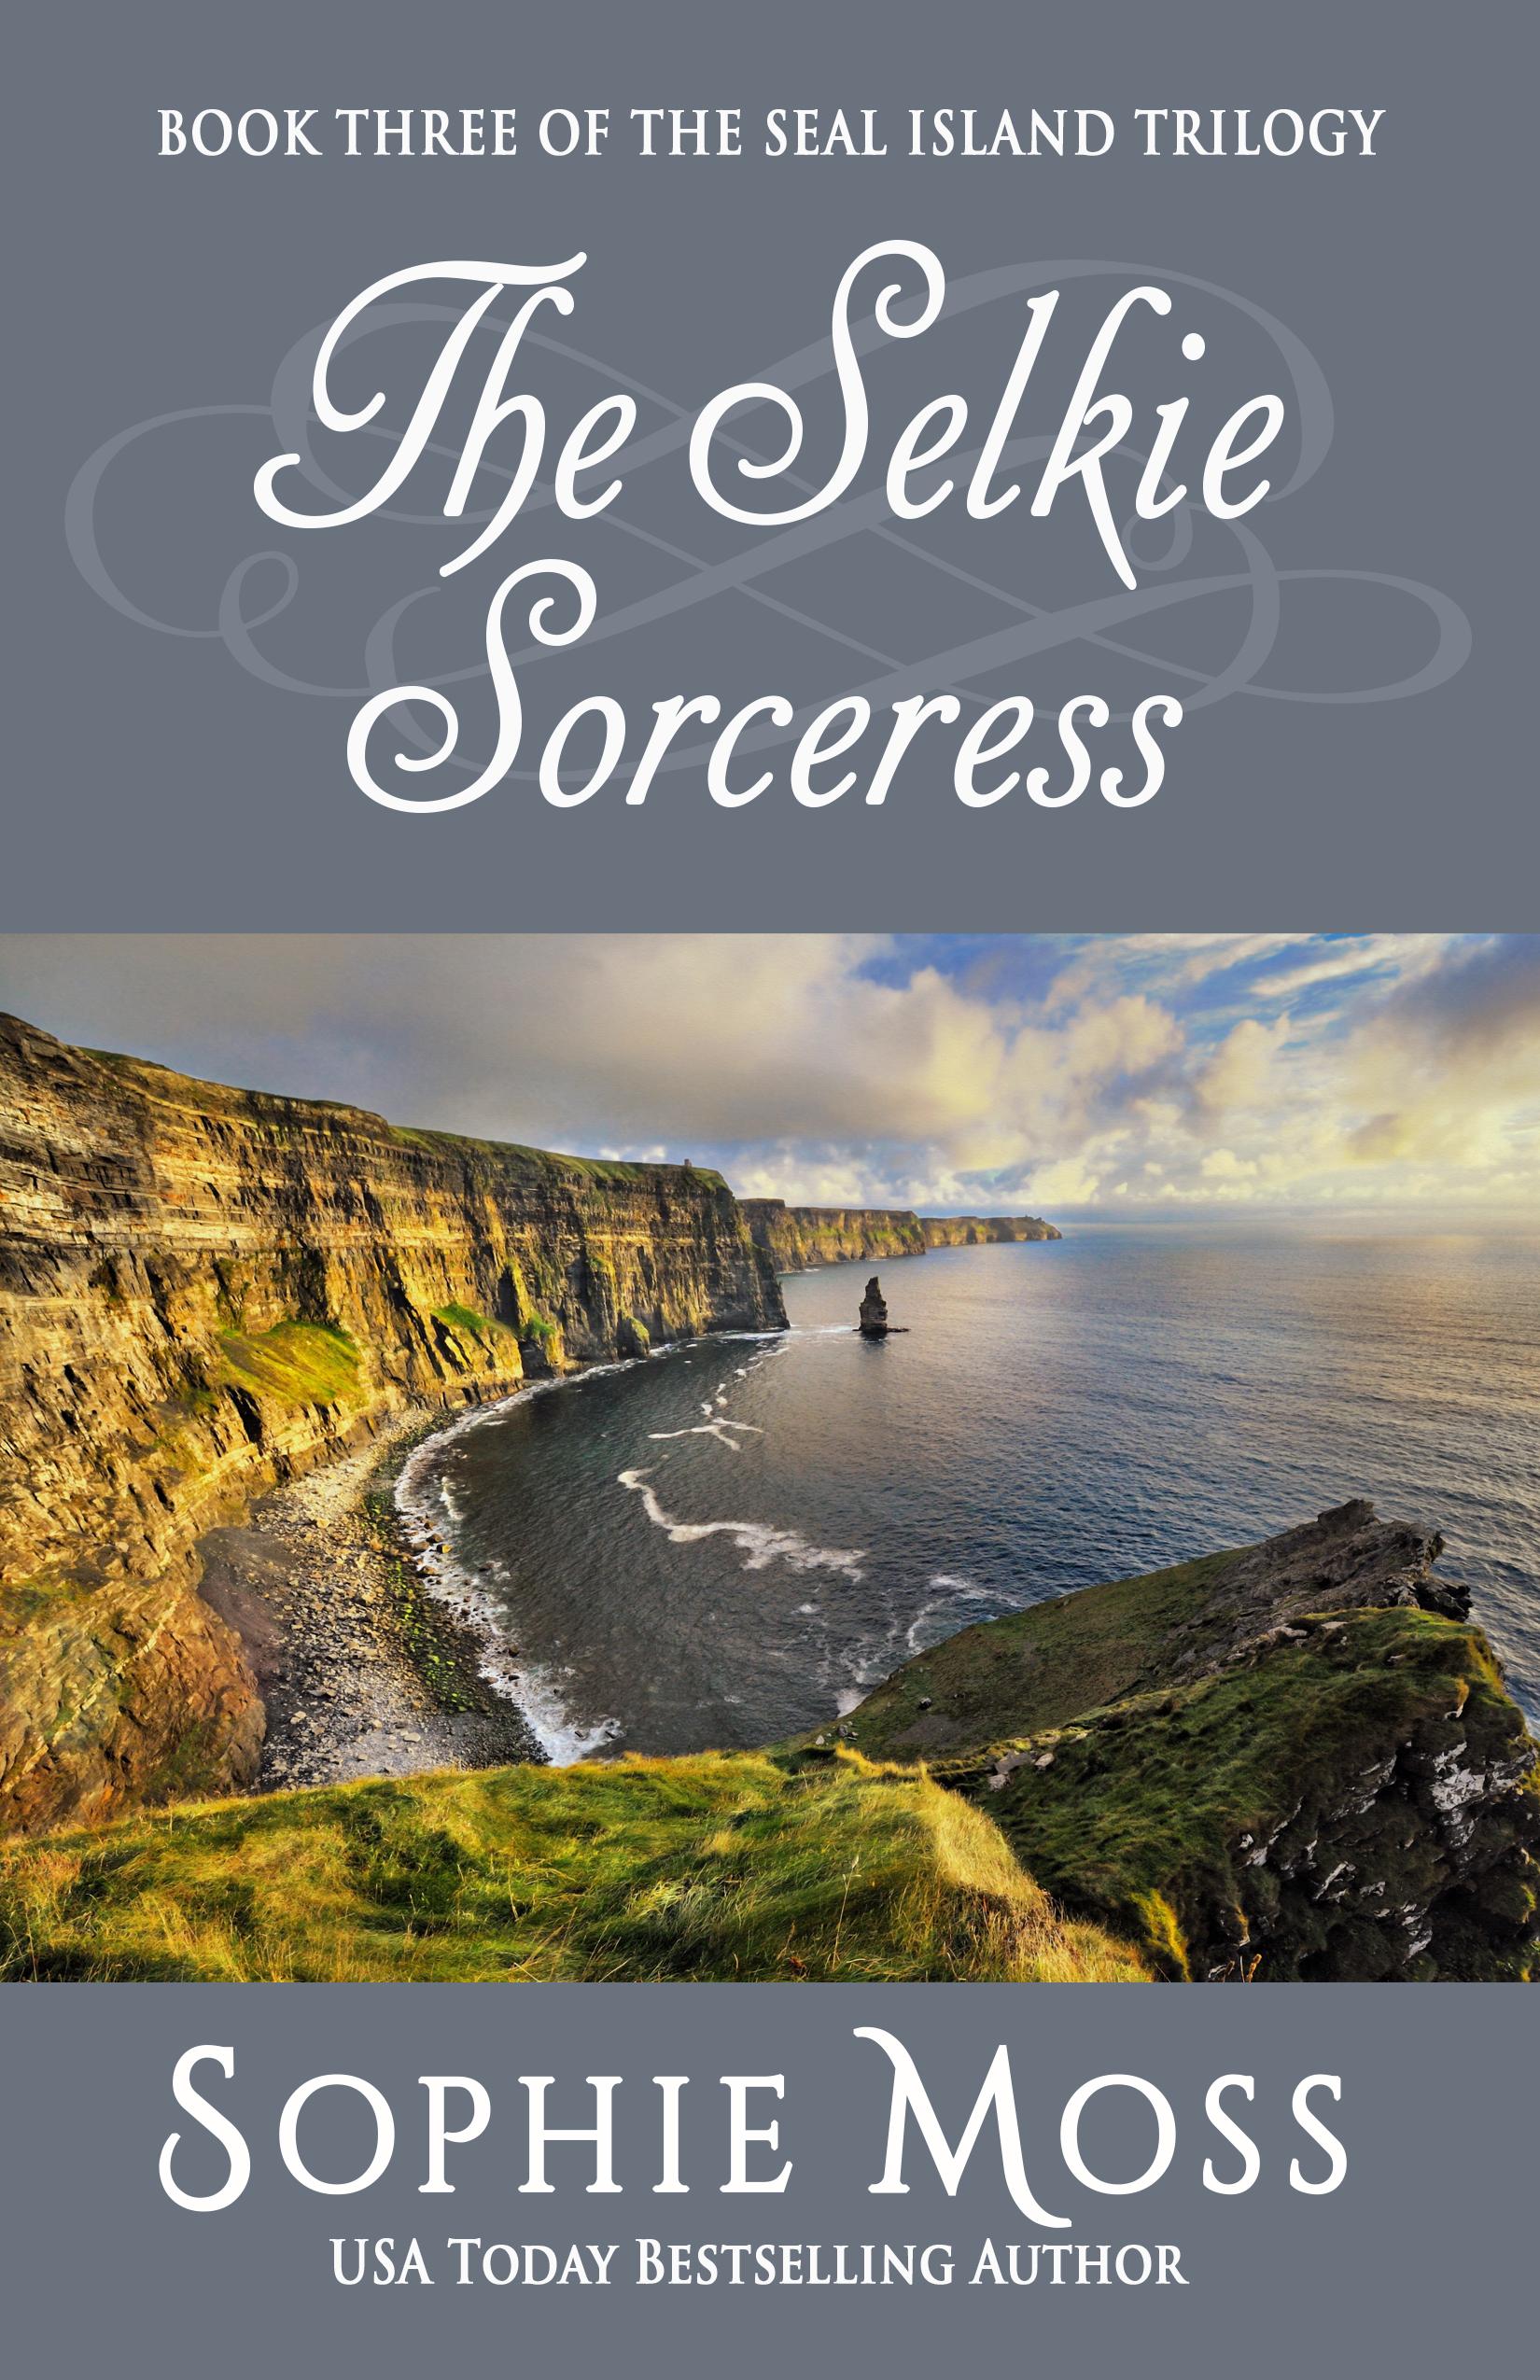 The Selkie Sorceress ebook cover Aug 14 2017 VELLUM.jpg